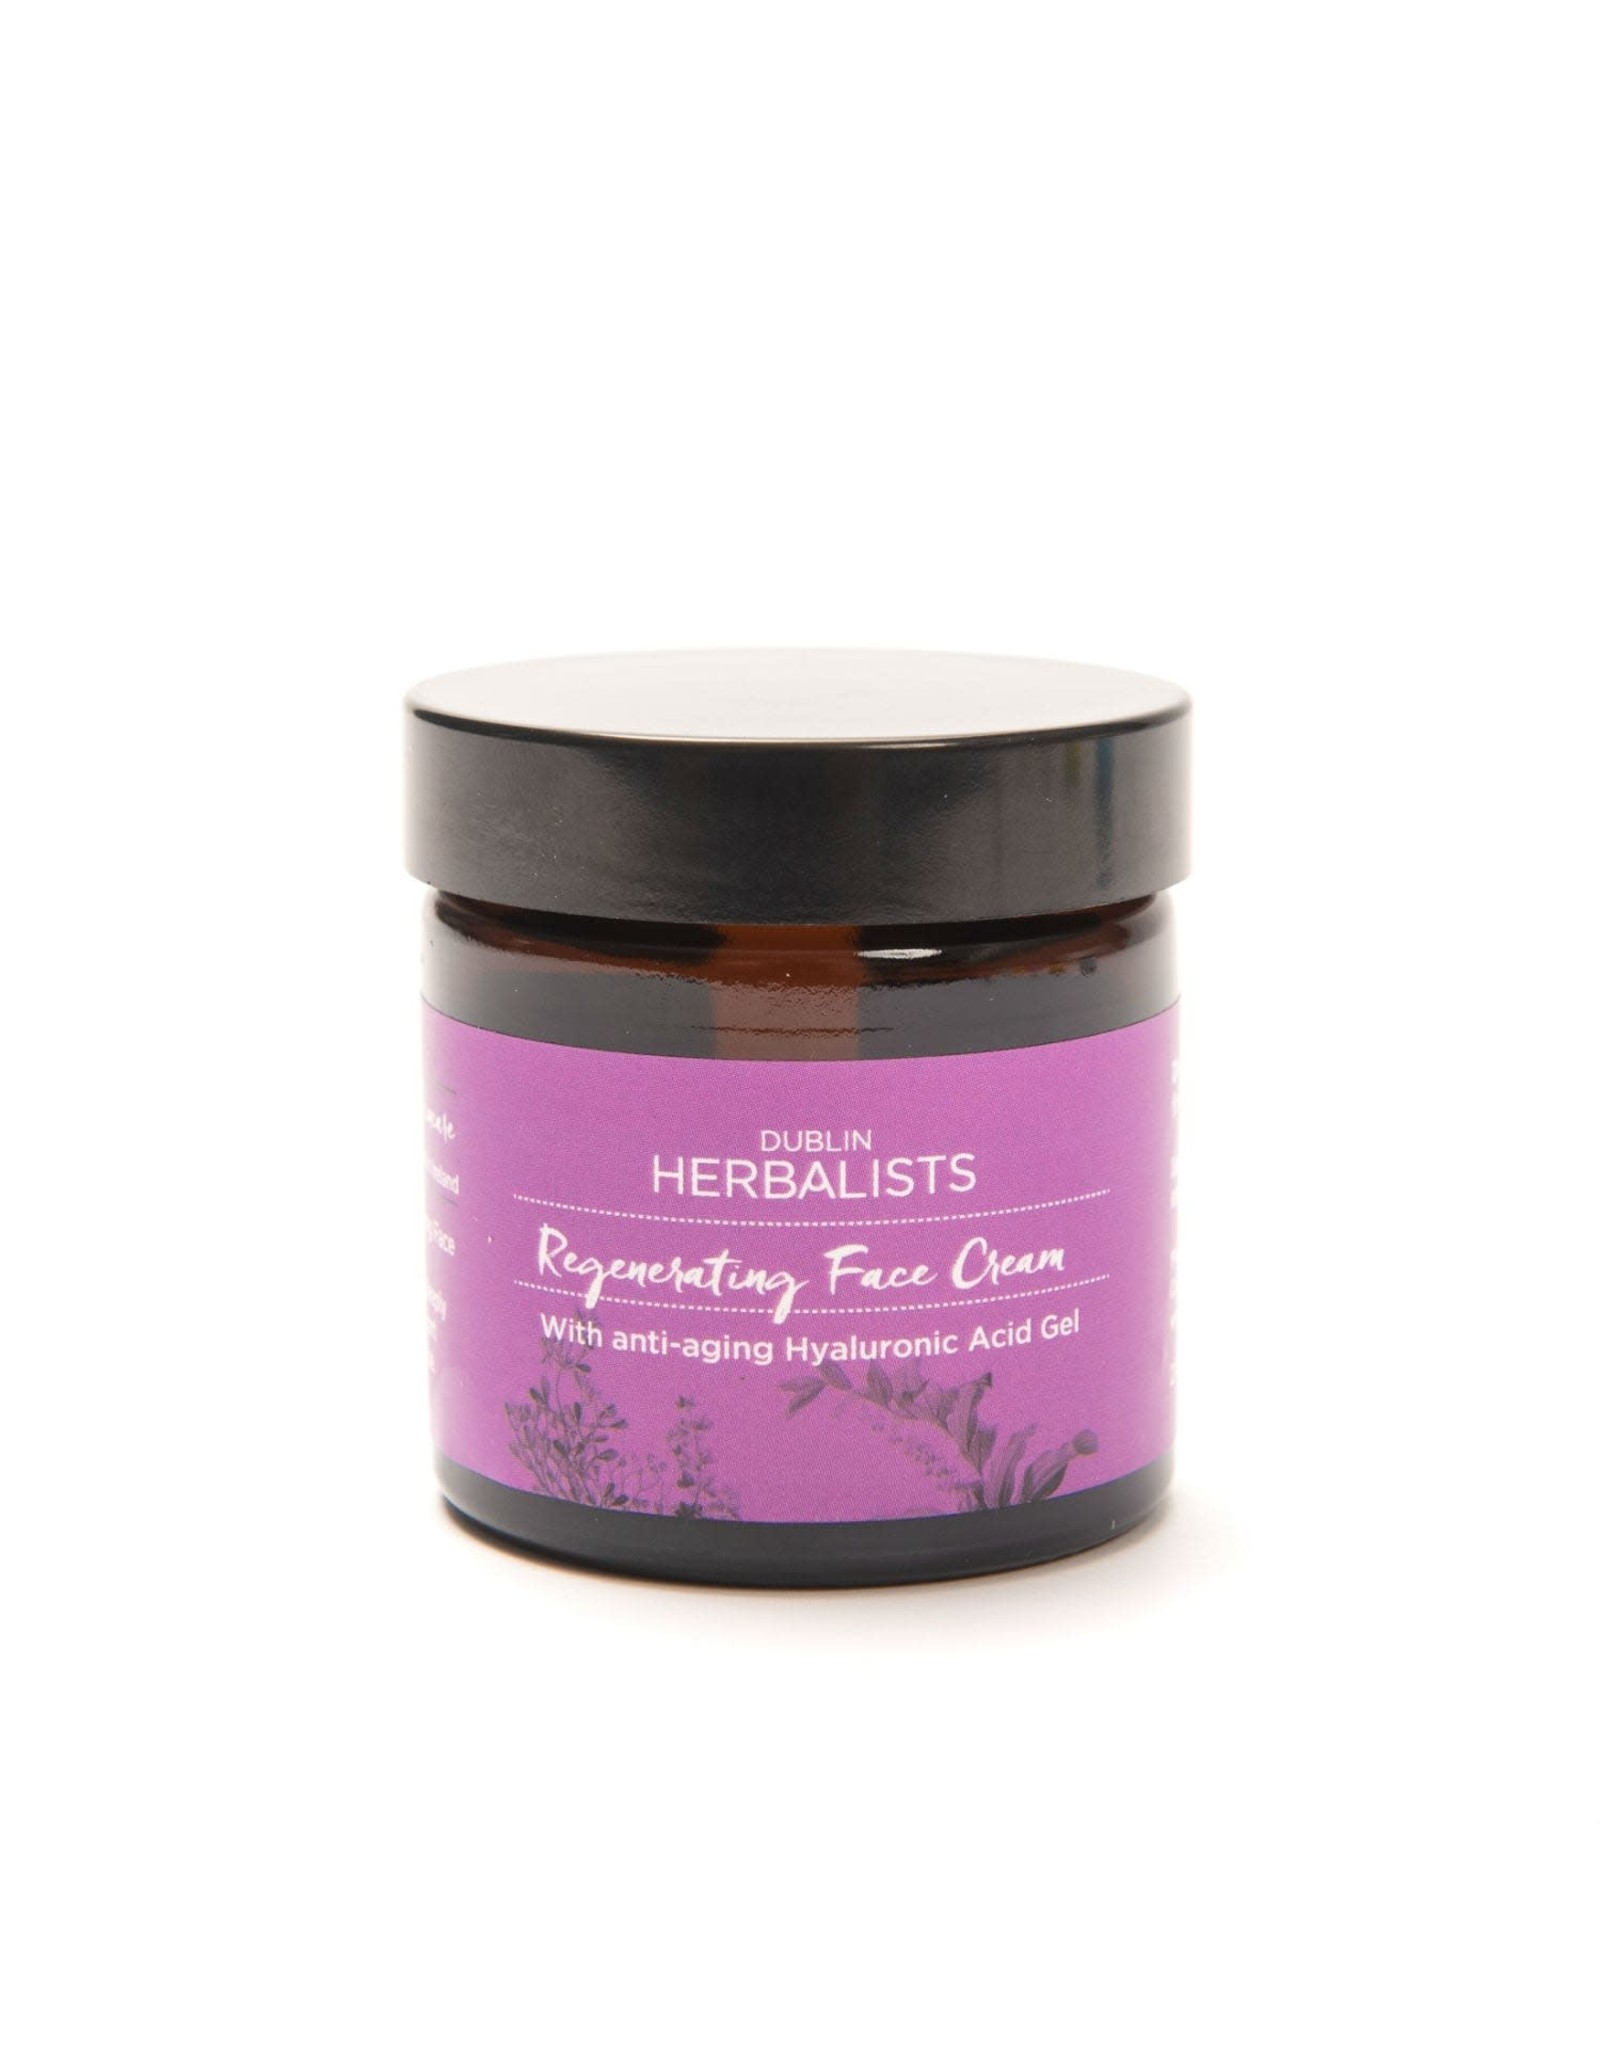 Dublin Herbalists Regenerating Face Cream by Dublin Herbalists